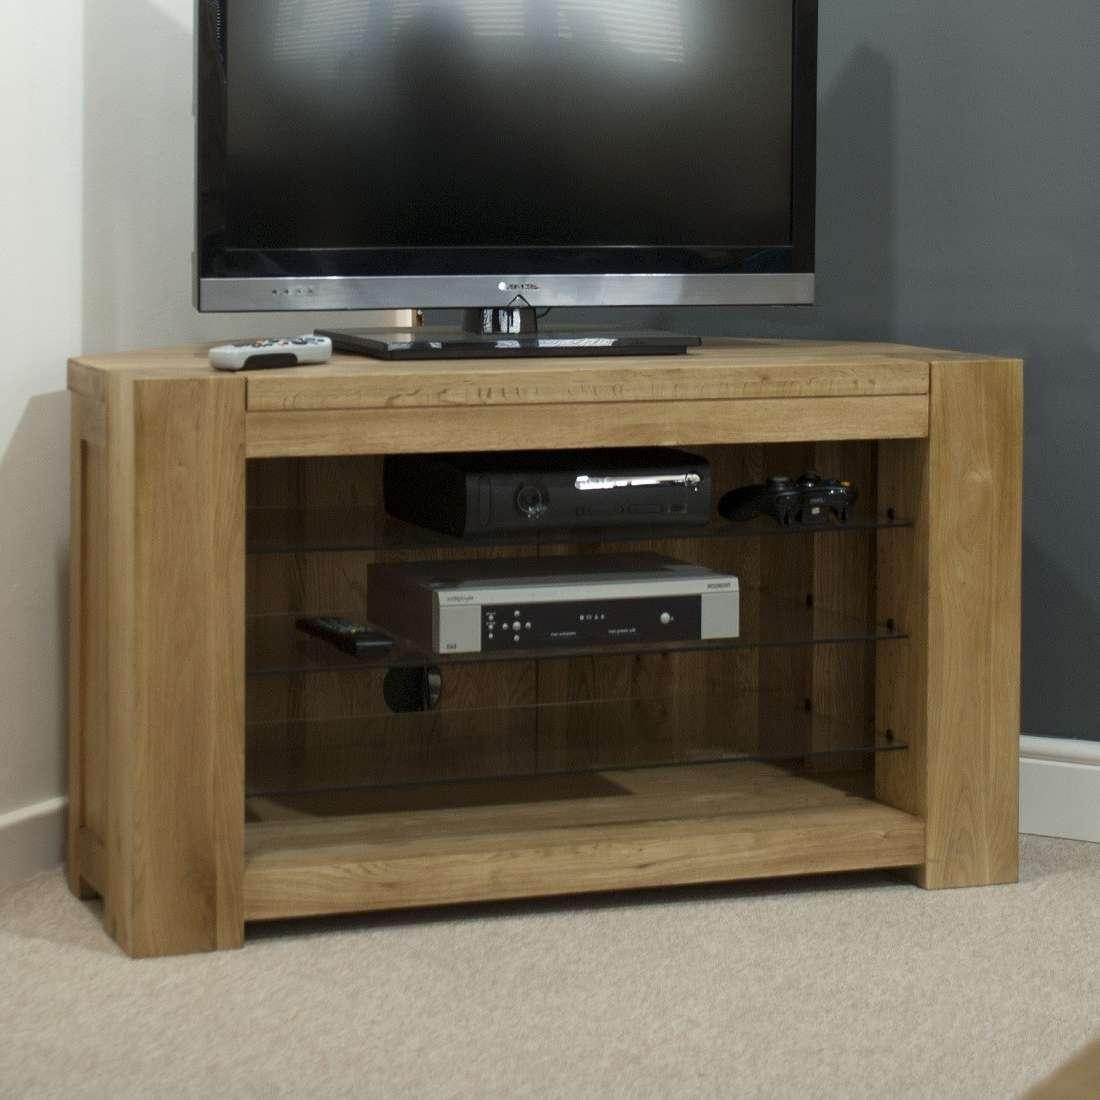 Tv Stands : Oak Tv Units Cabinets Furniture Uk Wooden Corner Solid Intended For Wooden Tv Stands Corner Units (View 13 of 15)